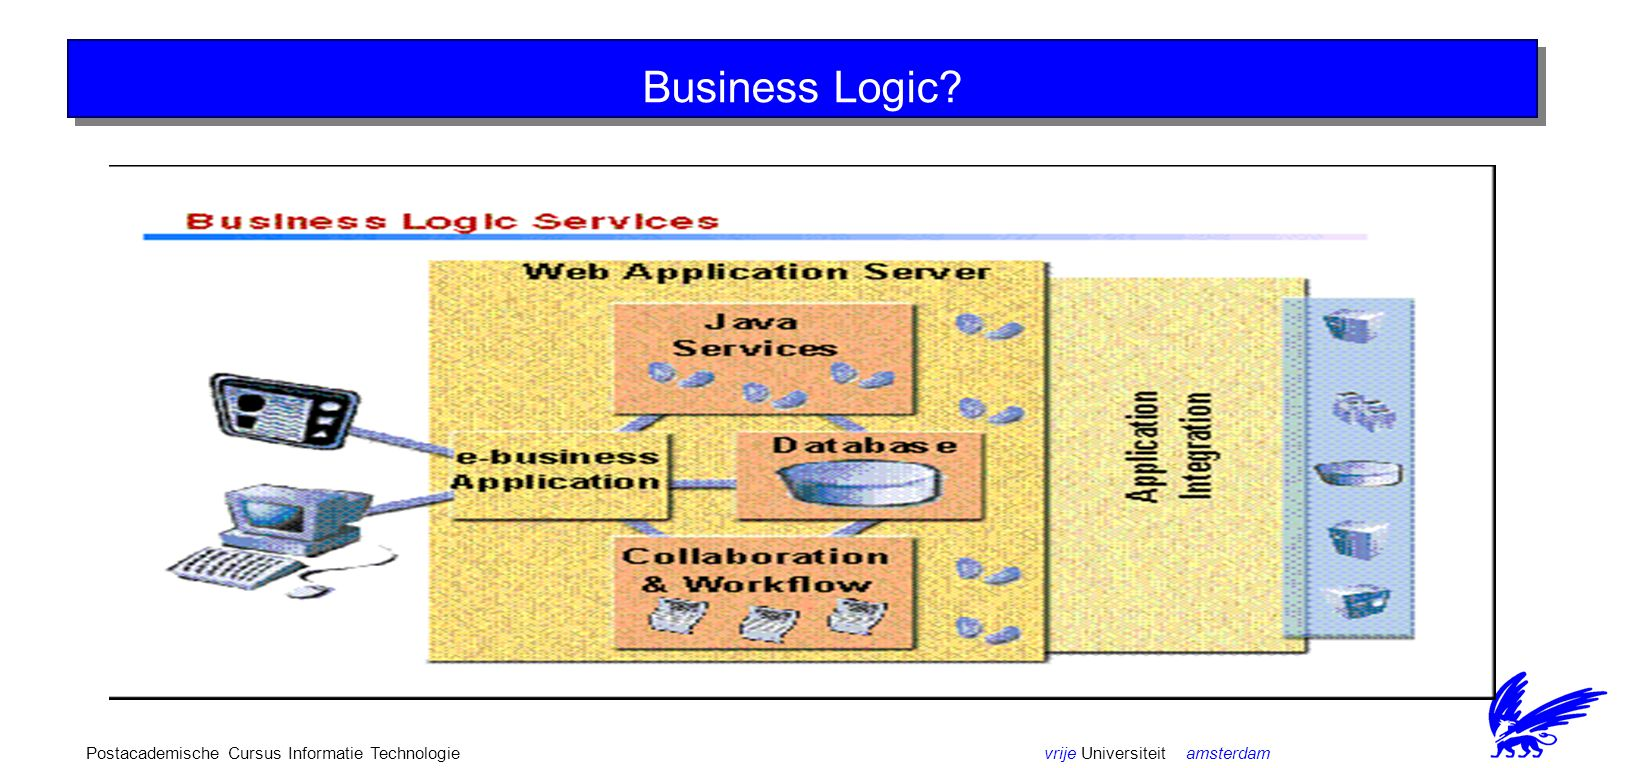 vrije Universiteit amsterdamPostacademische Cursus Informatie Technologie Web Application Server